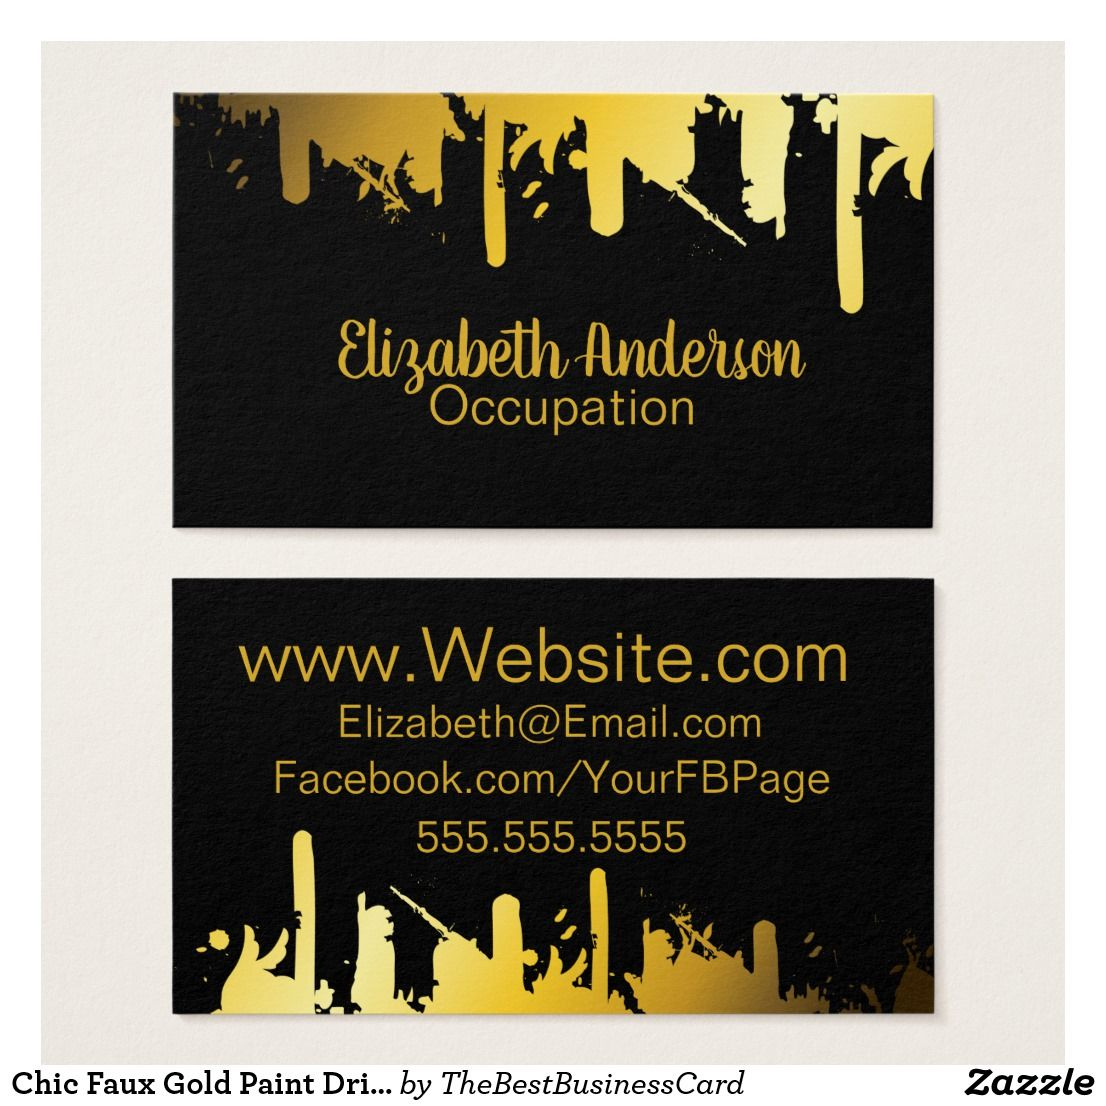 Chic faux gold paint drip modern business card modern